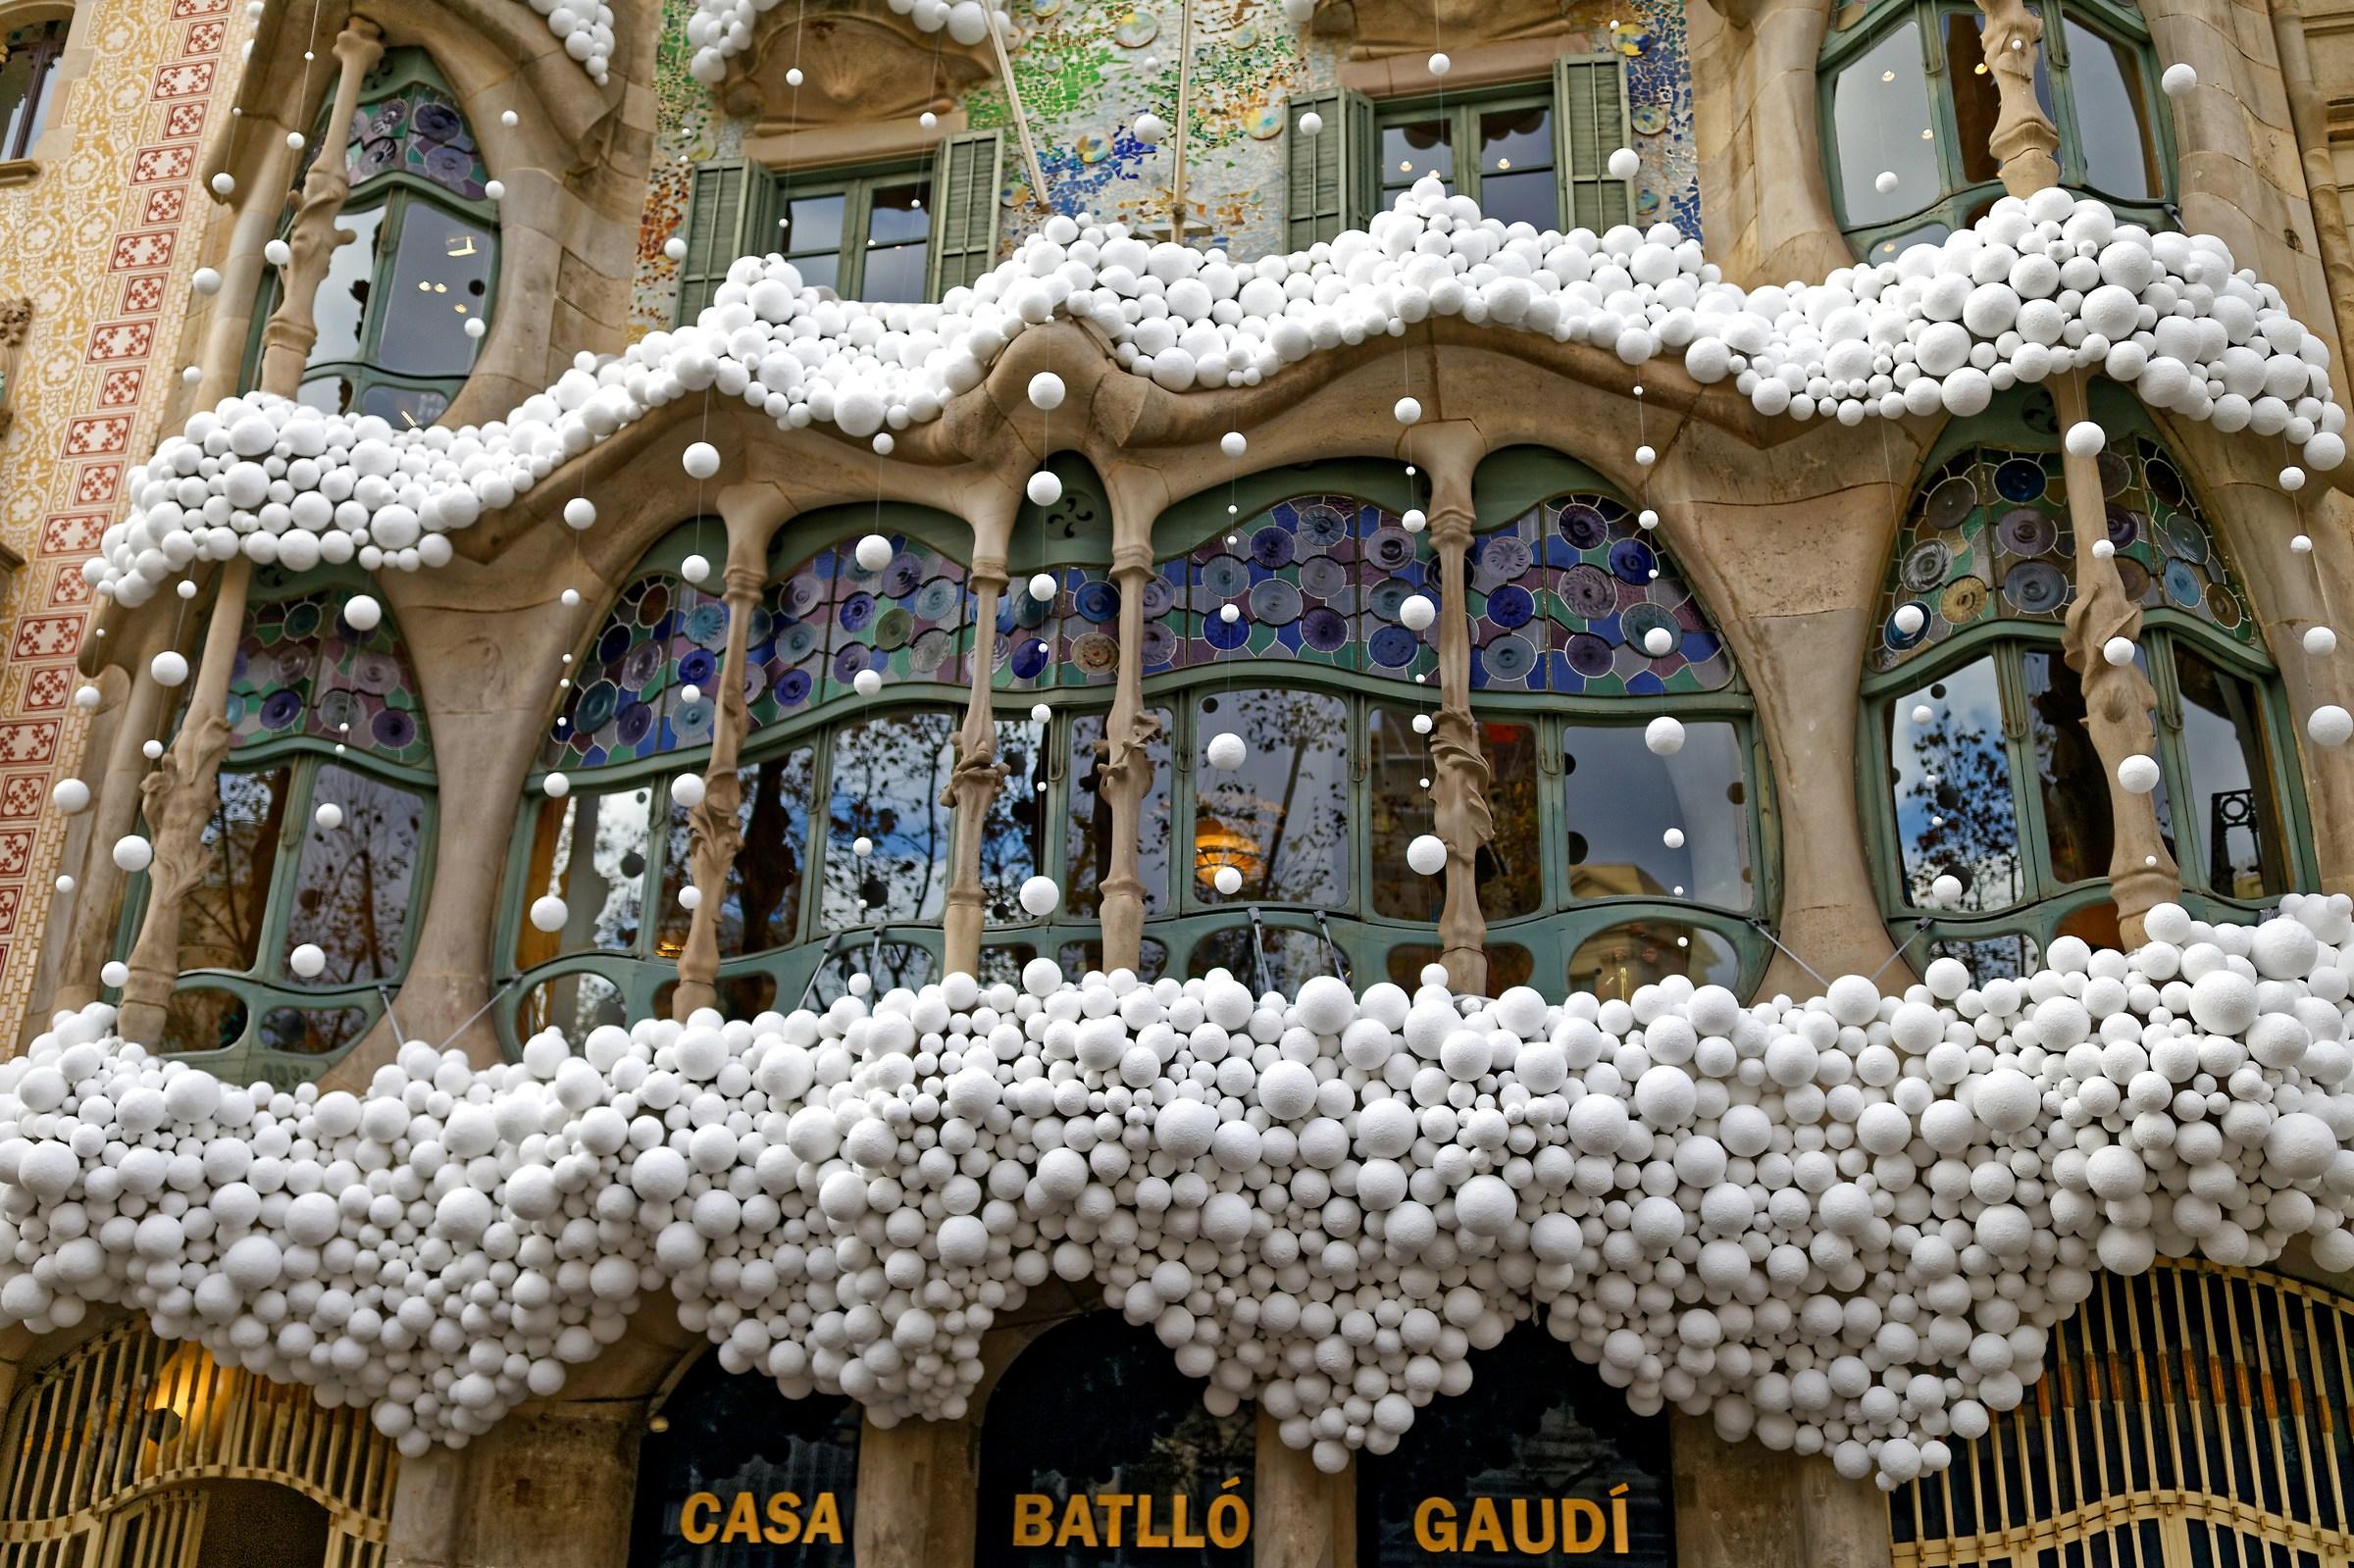 Viva Barcellona (Casa Batllò)...